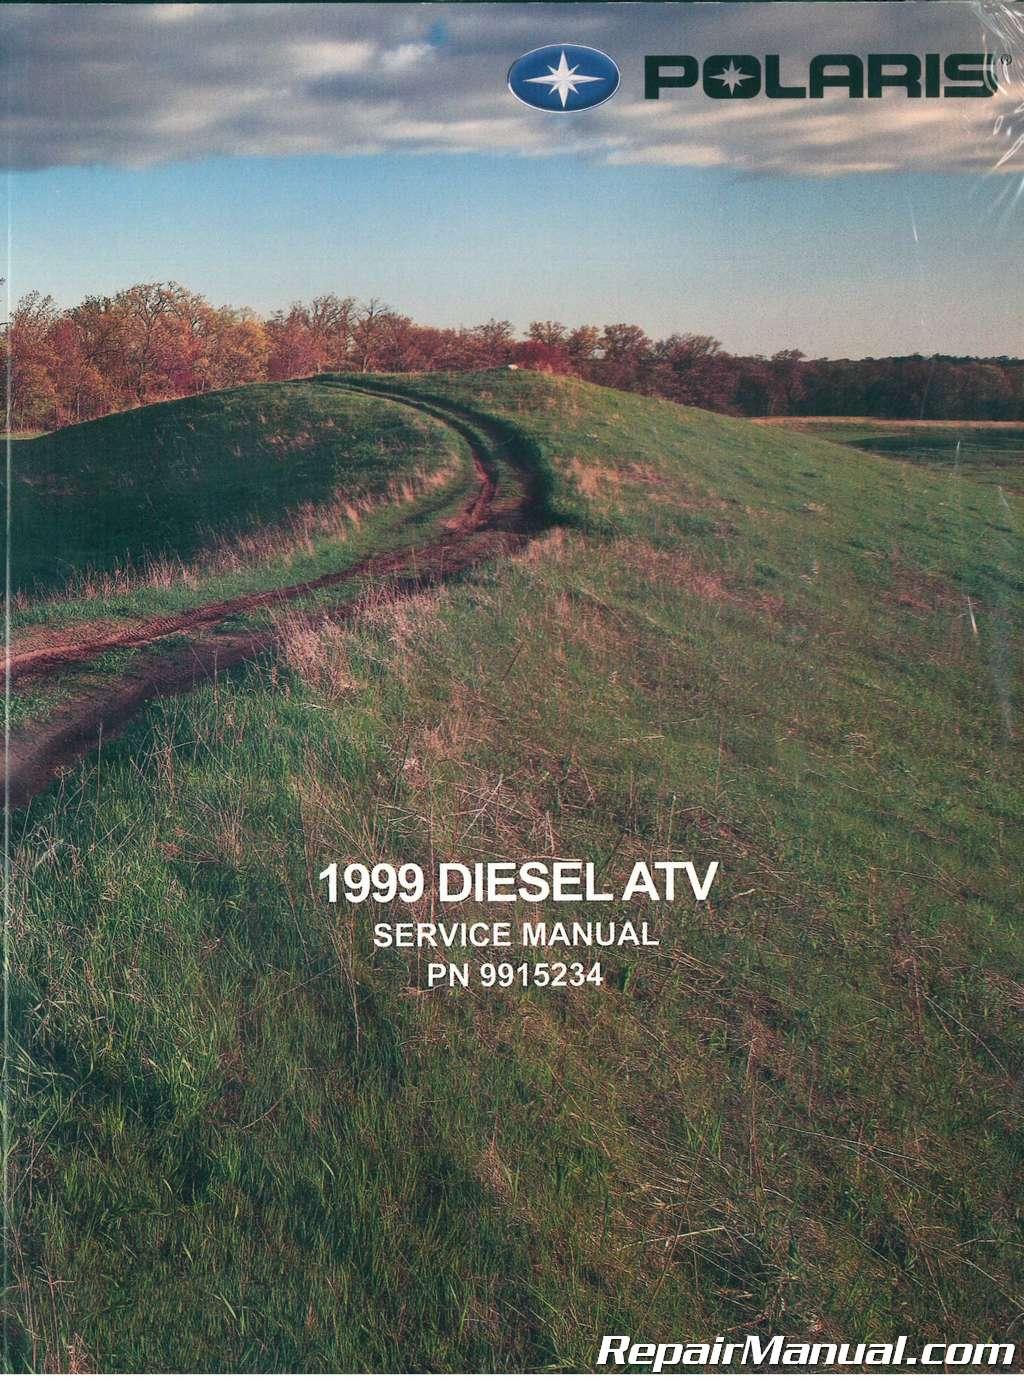 1999 polaris 455 4 4 diesel atv service manual rh repairmanual com 1999 500 Polaris 4x4 Diesel 1999 500 Polaris 4x4 Diesel